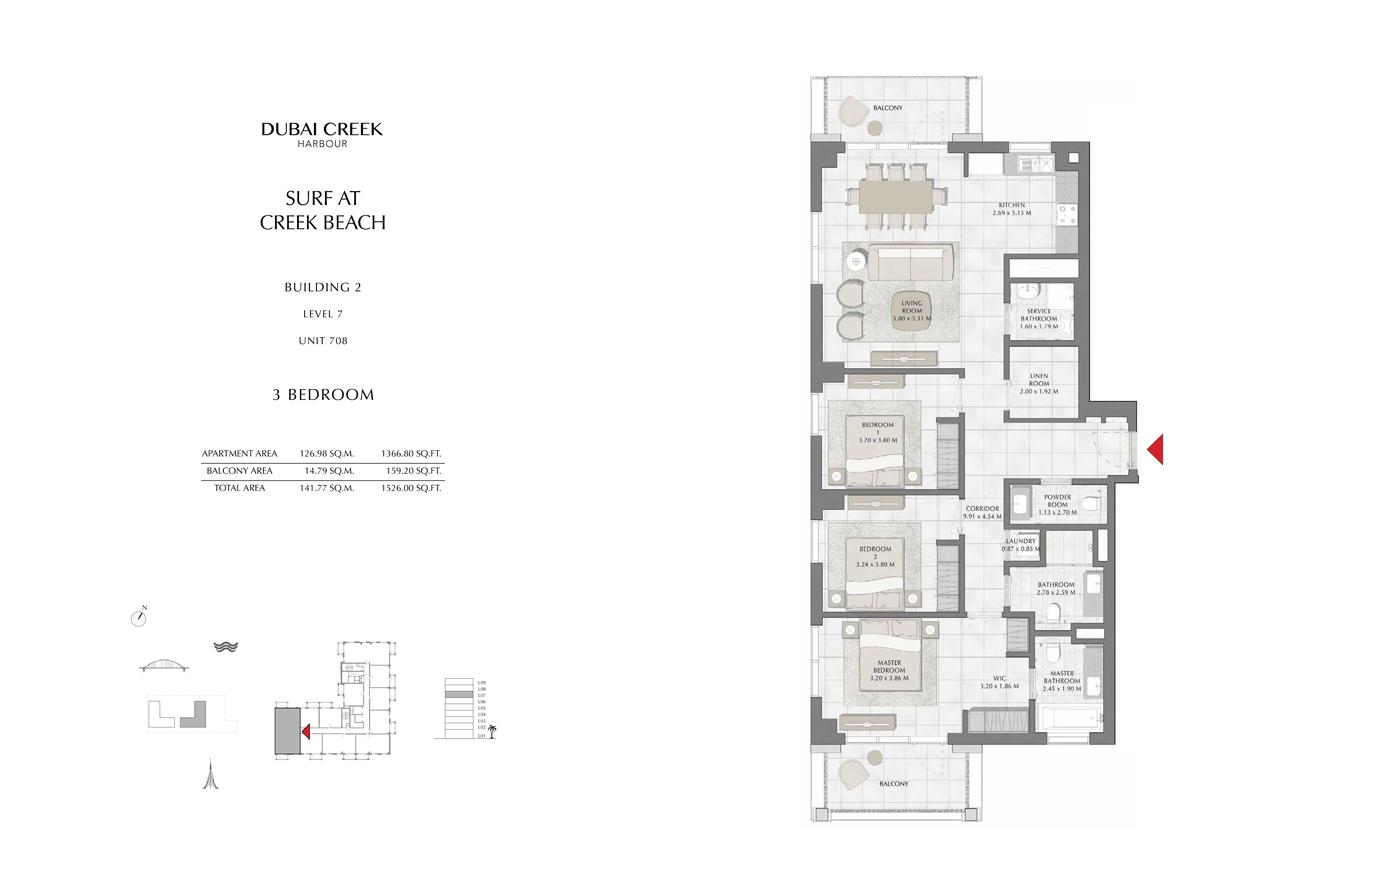 Building 2, 3 Bedroom Level 7, Size 1526 Sq Ft